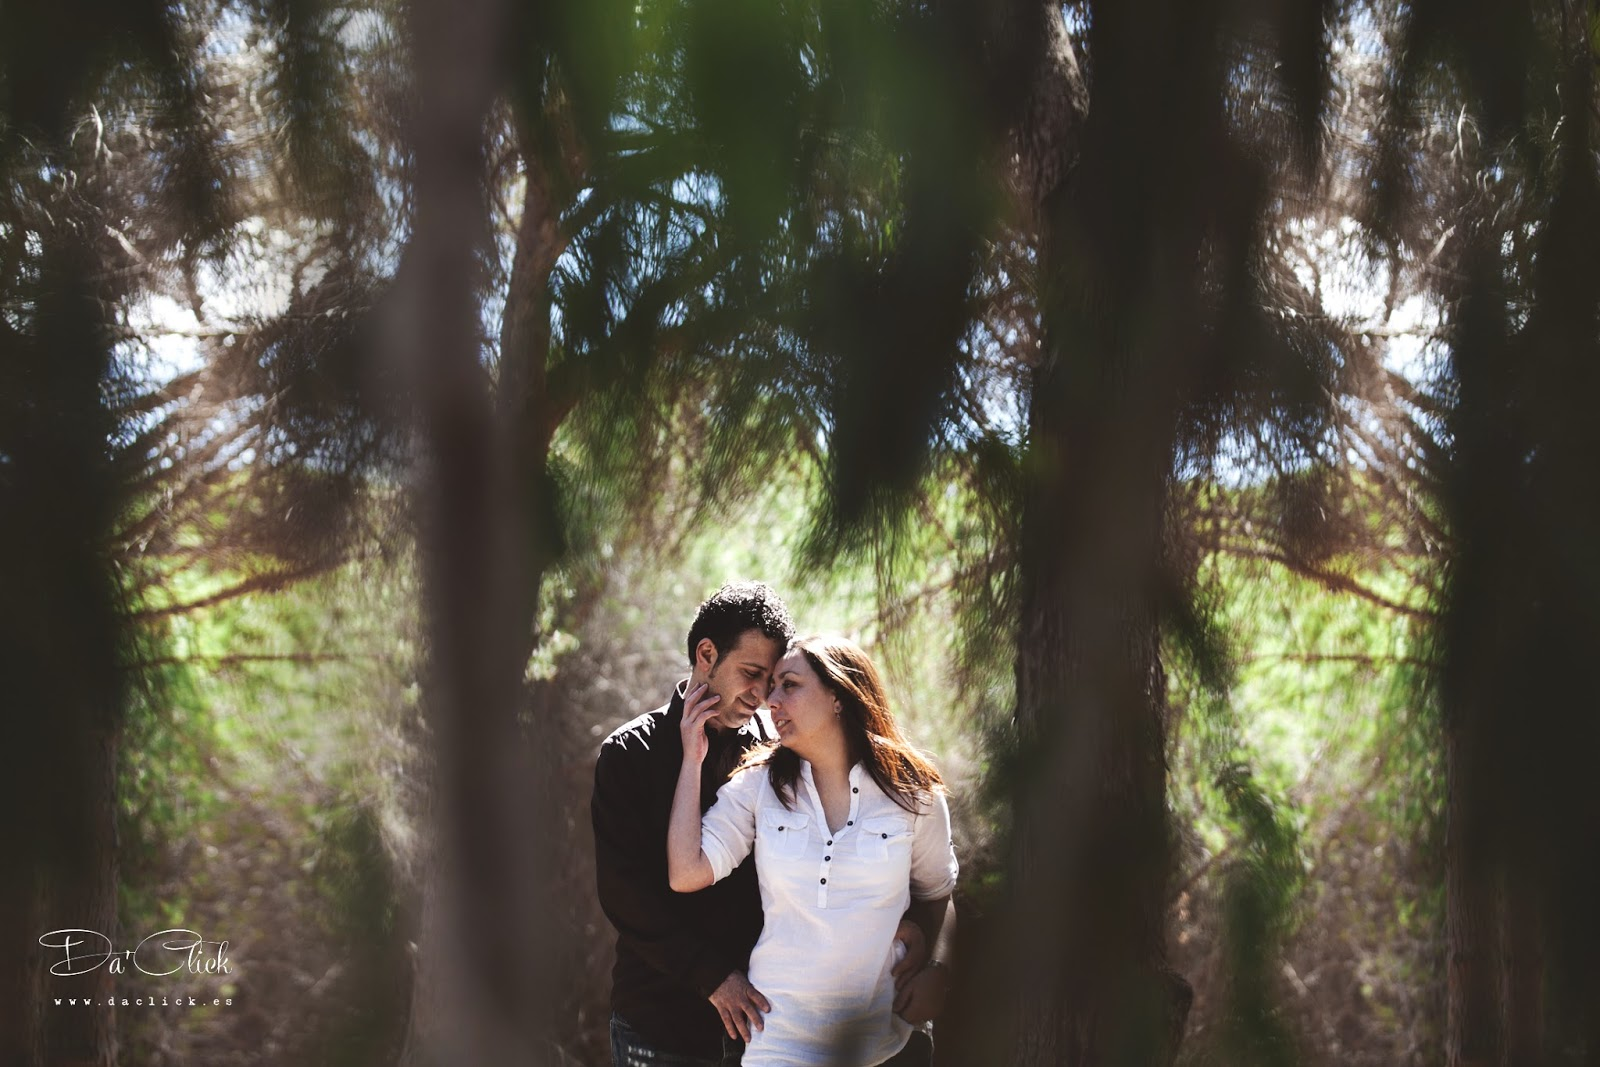 pareja romantica en naturaleza